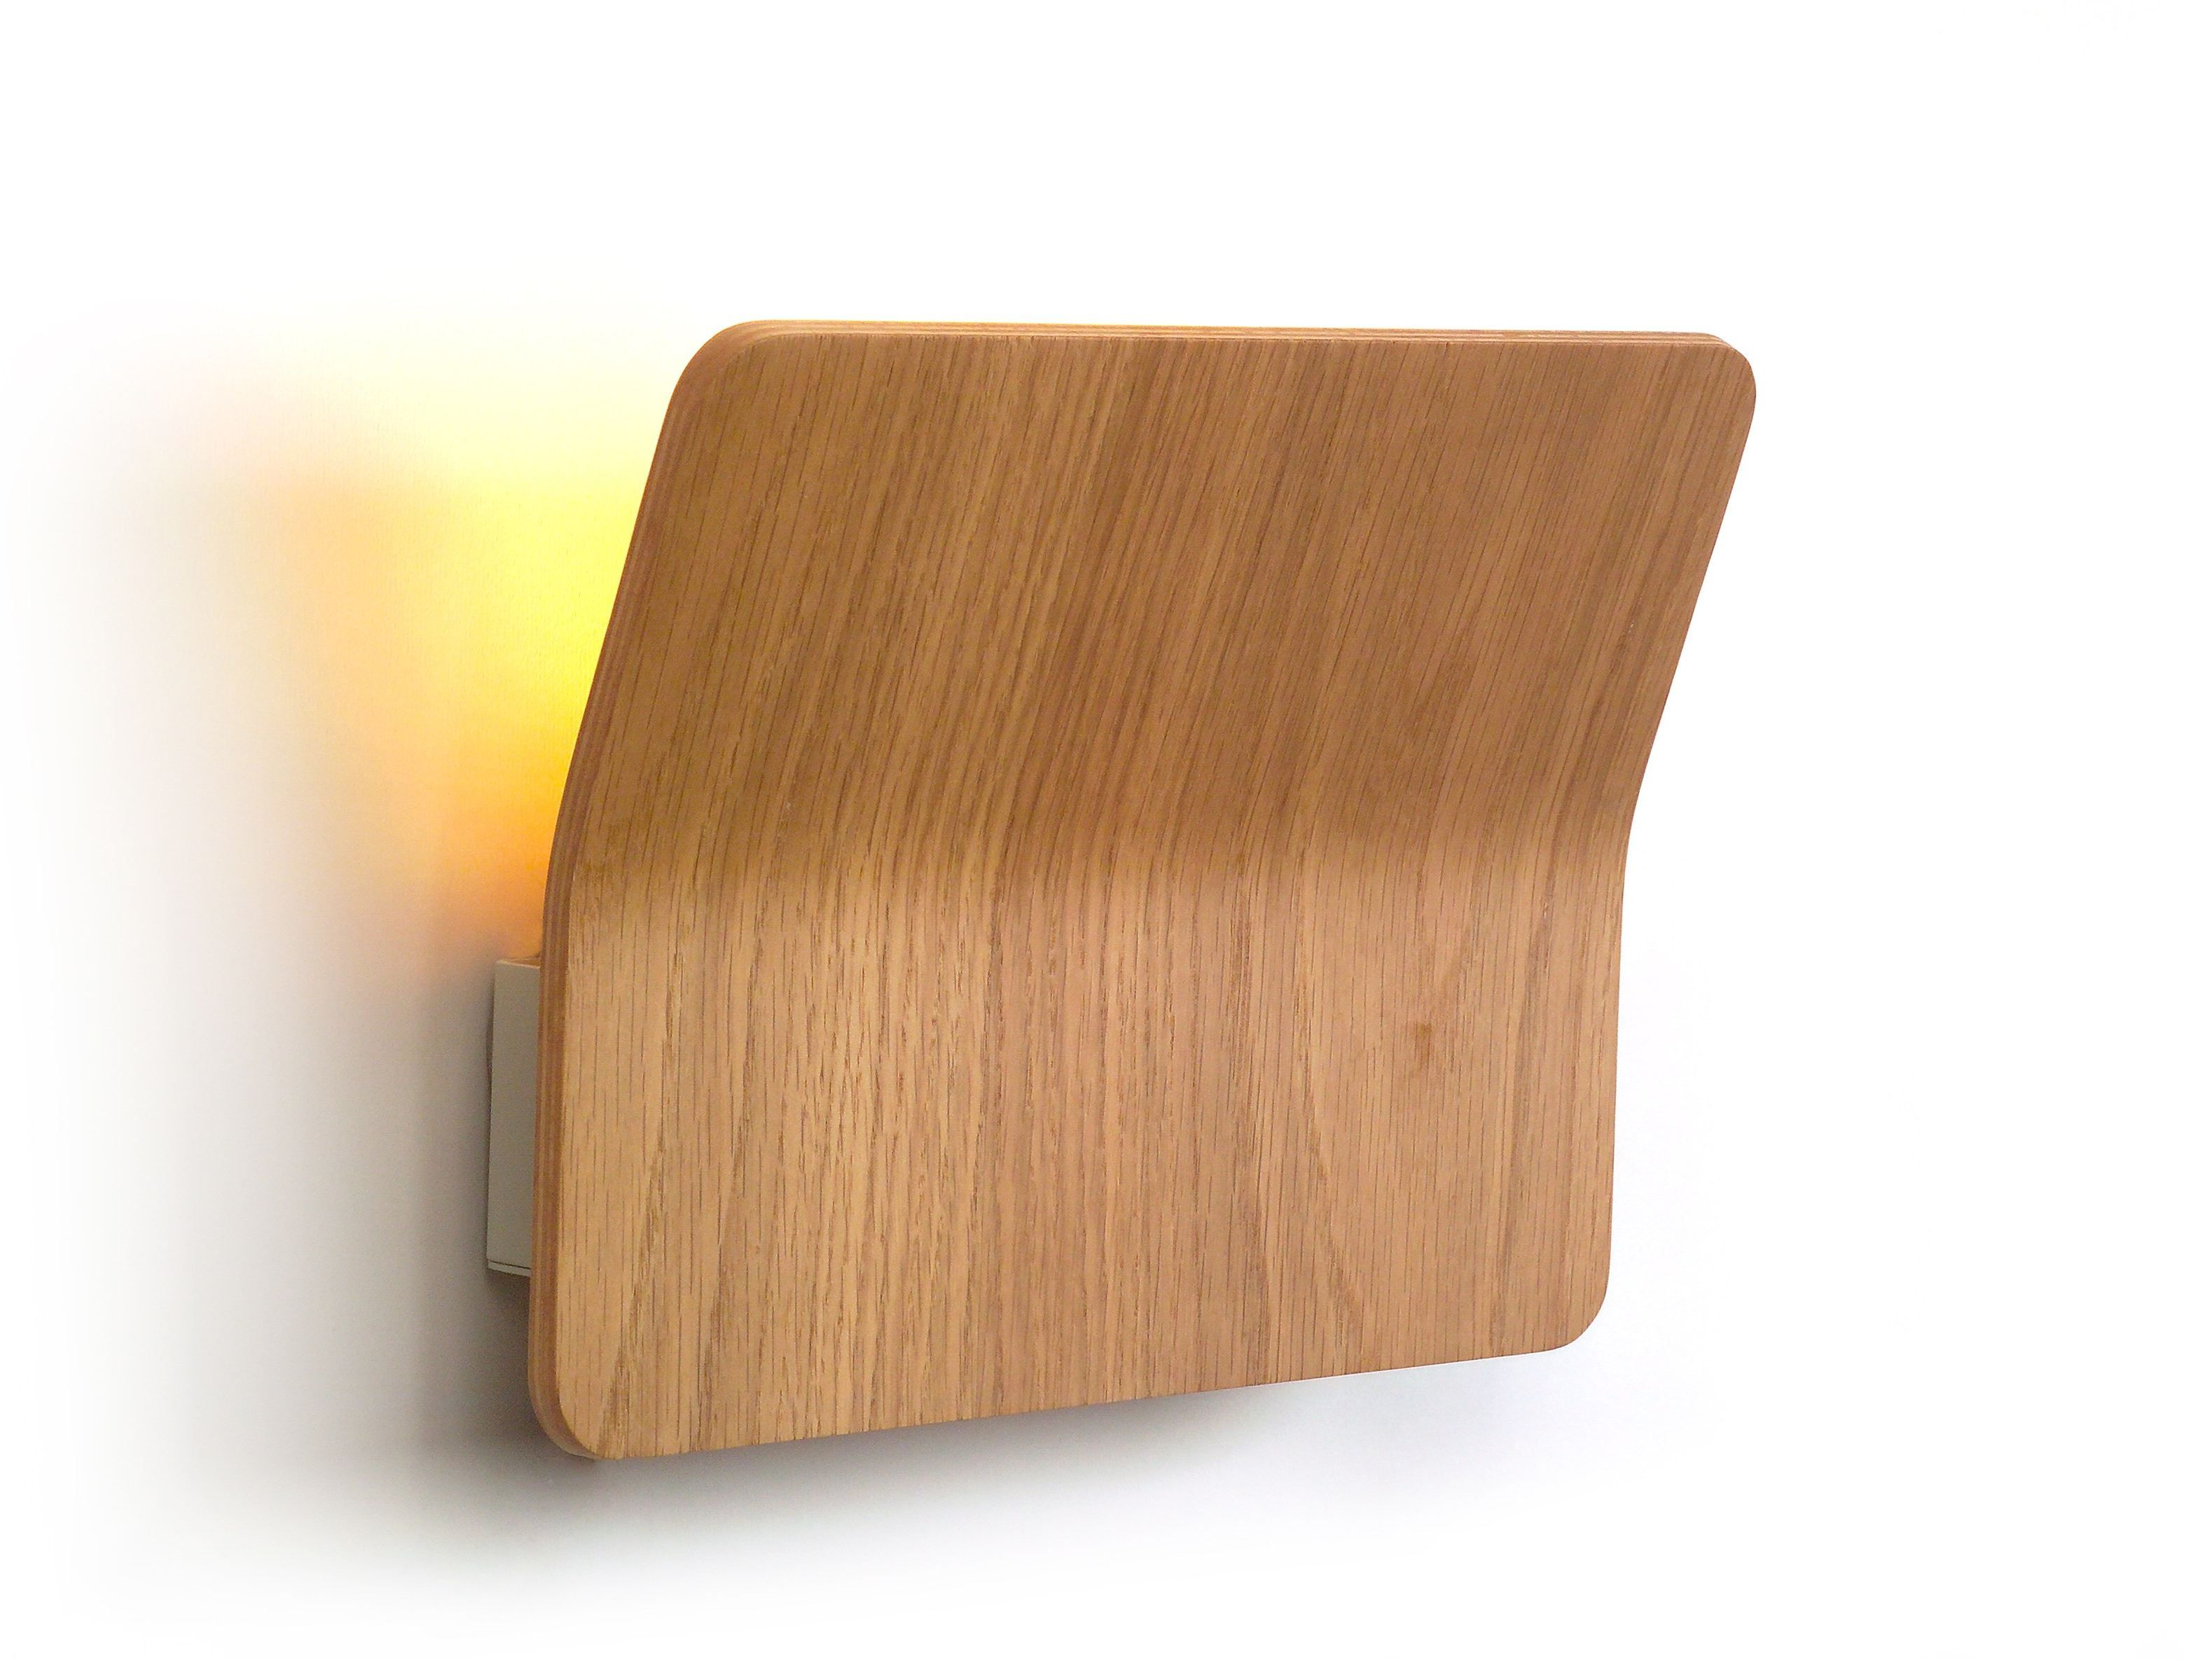 Led wooden wall light kito luxcambra lighting legno